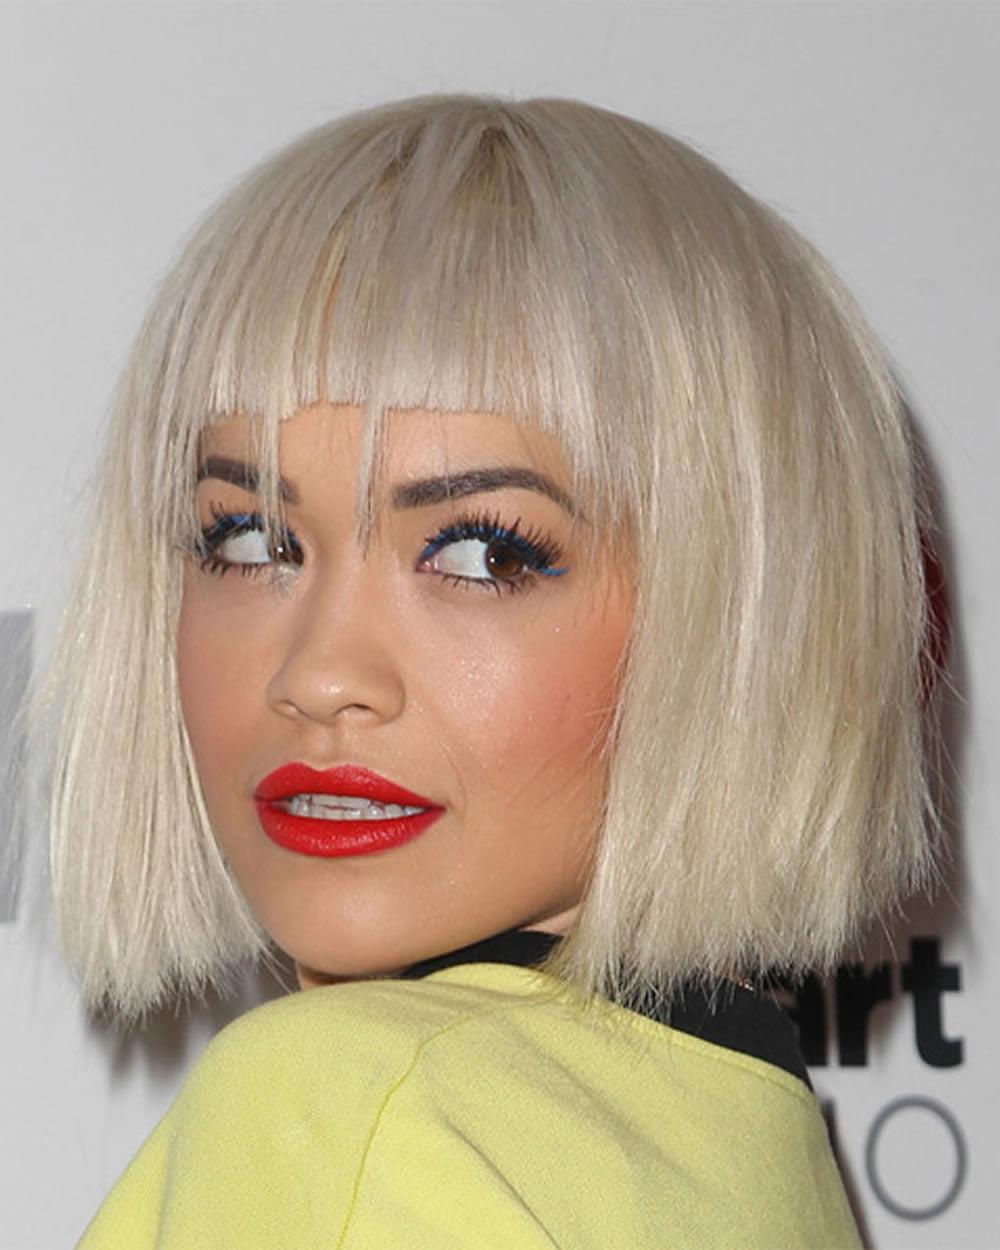 Wedding Hairstyles Youtube: Rita Ora's Short Hairstyles (Pixie + Bob) For 2018